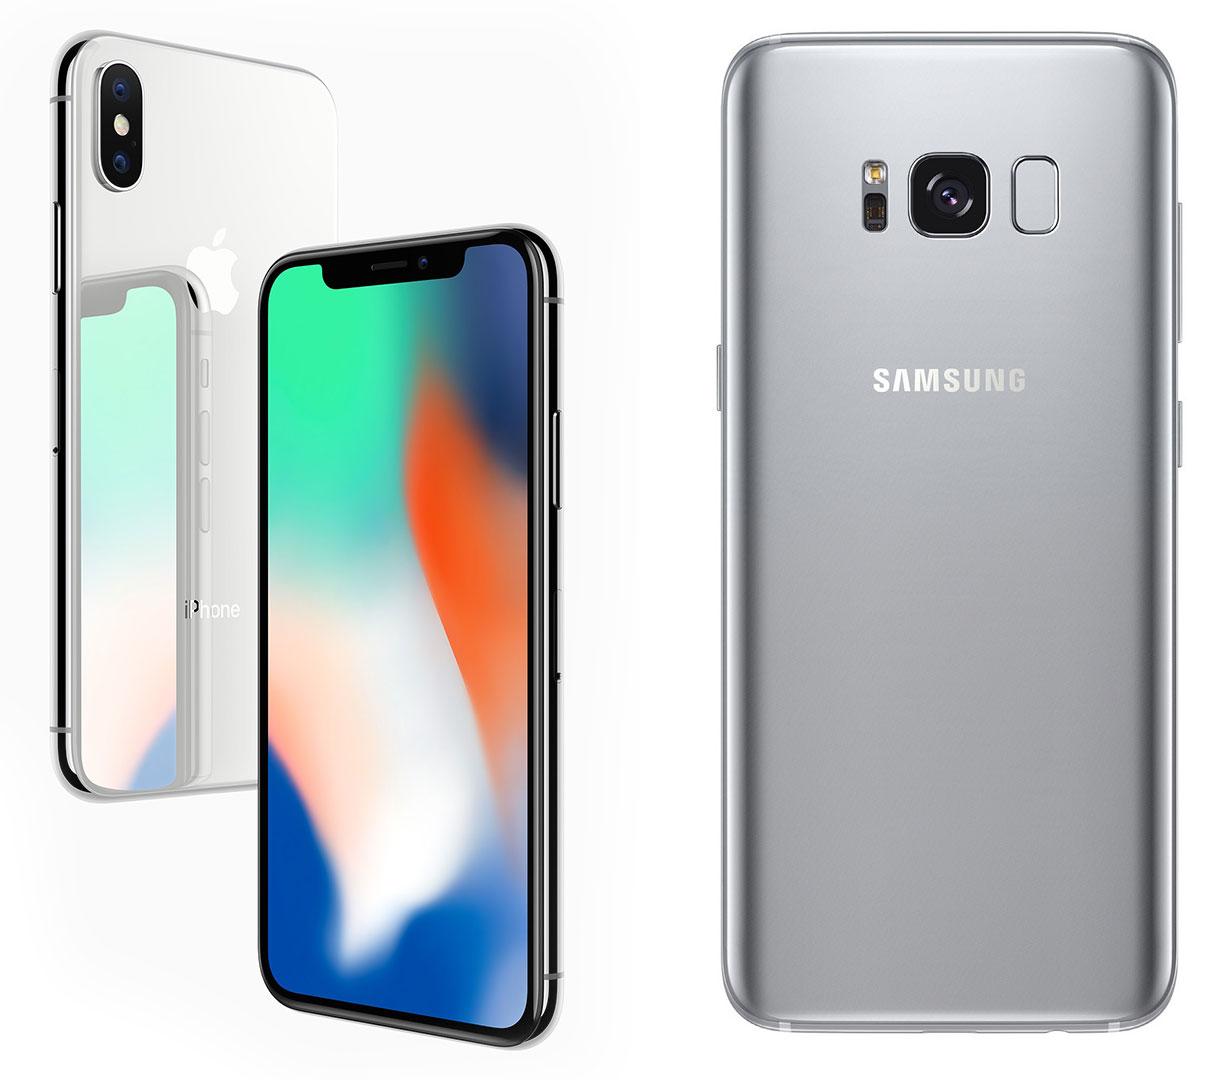 Toppreise Iphone S